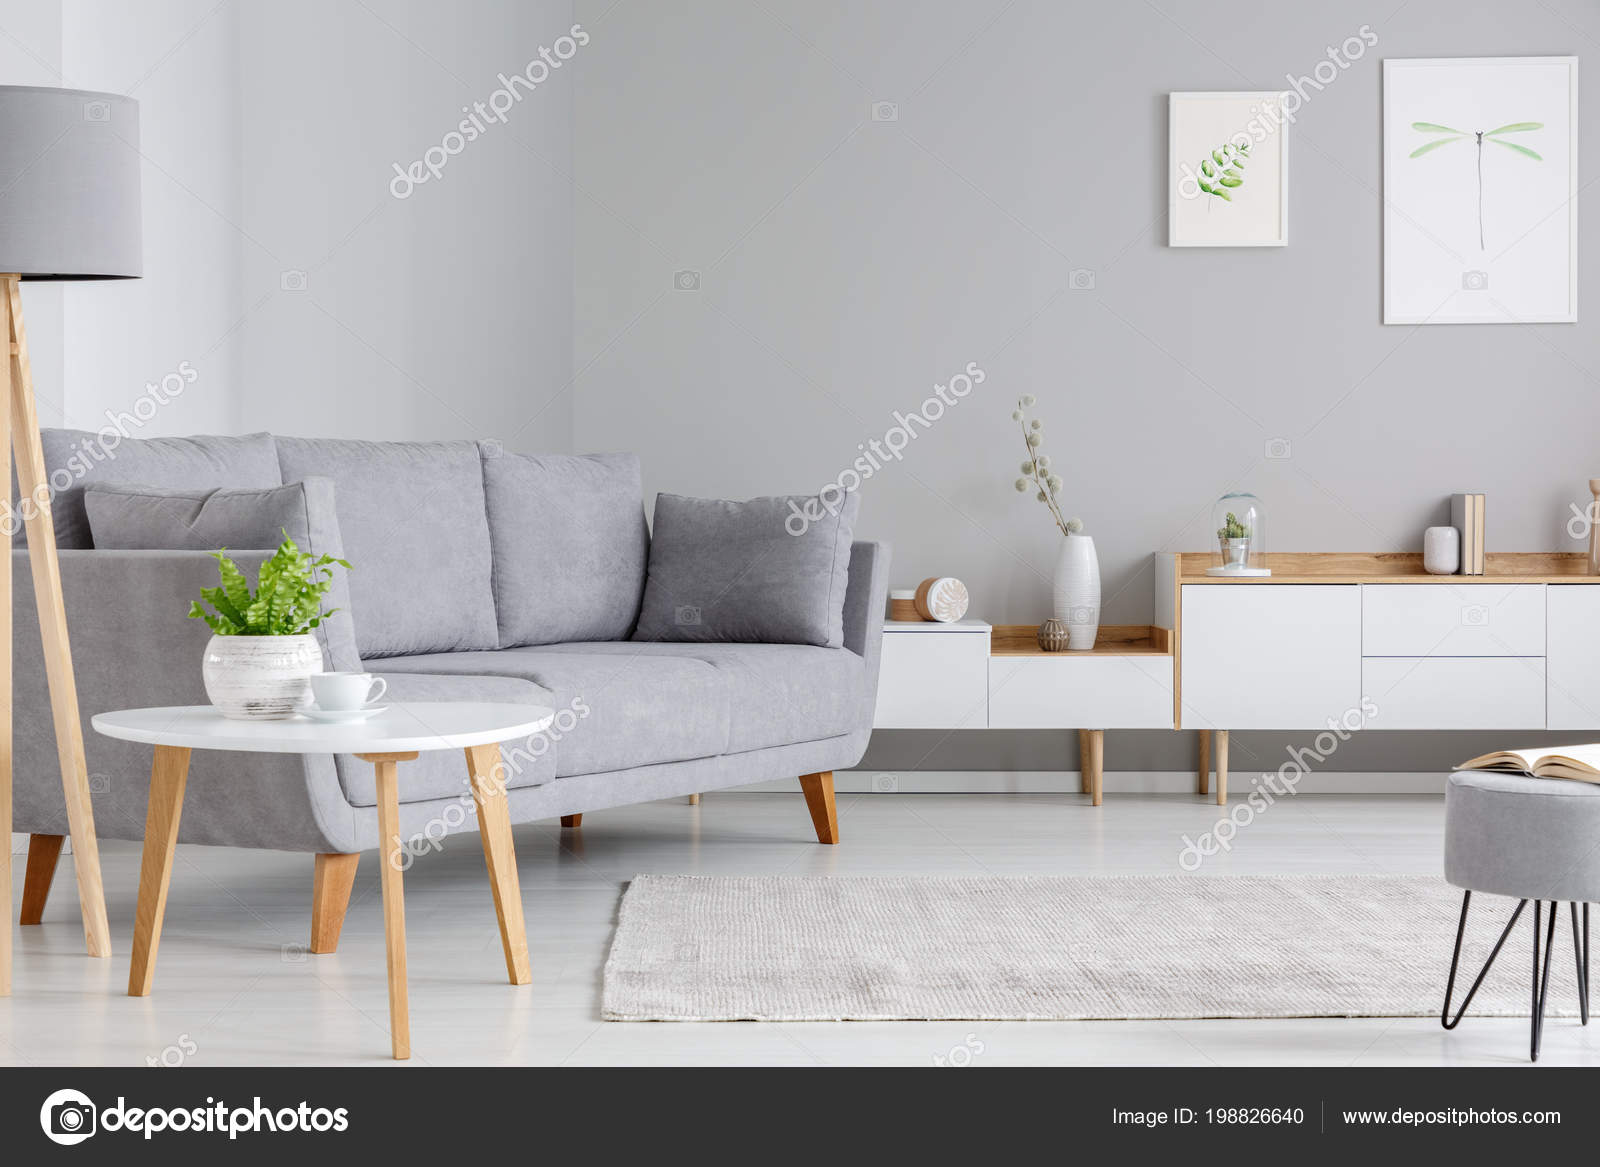 Geräumig Sofa Scandi Dekoration Von Table Next Grey Living Room Interior Posters